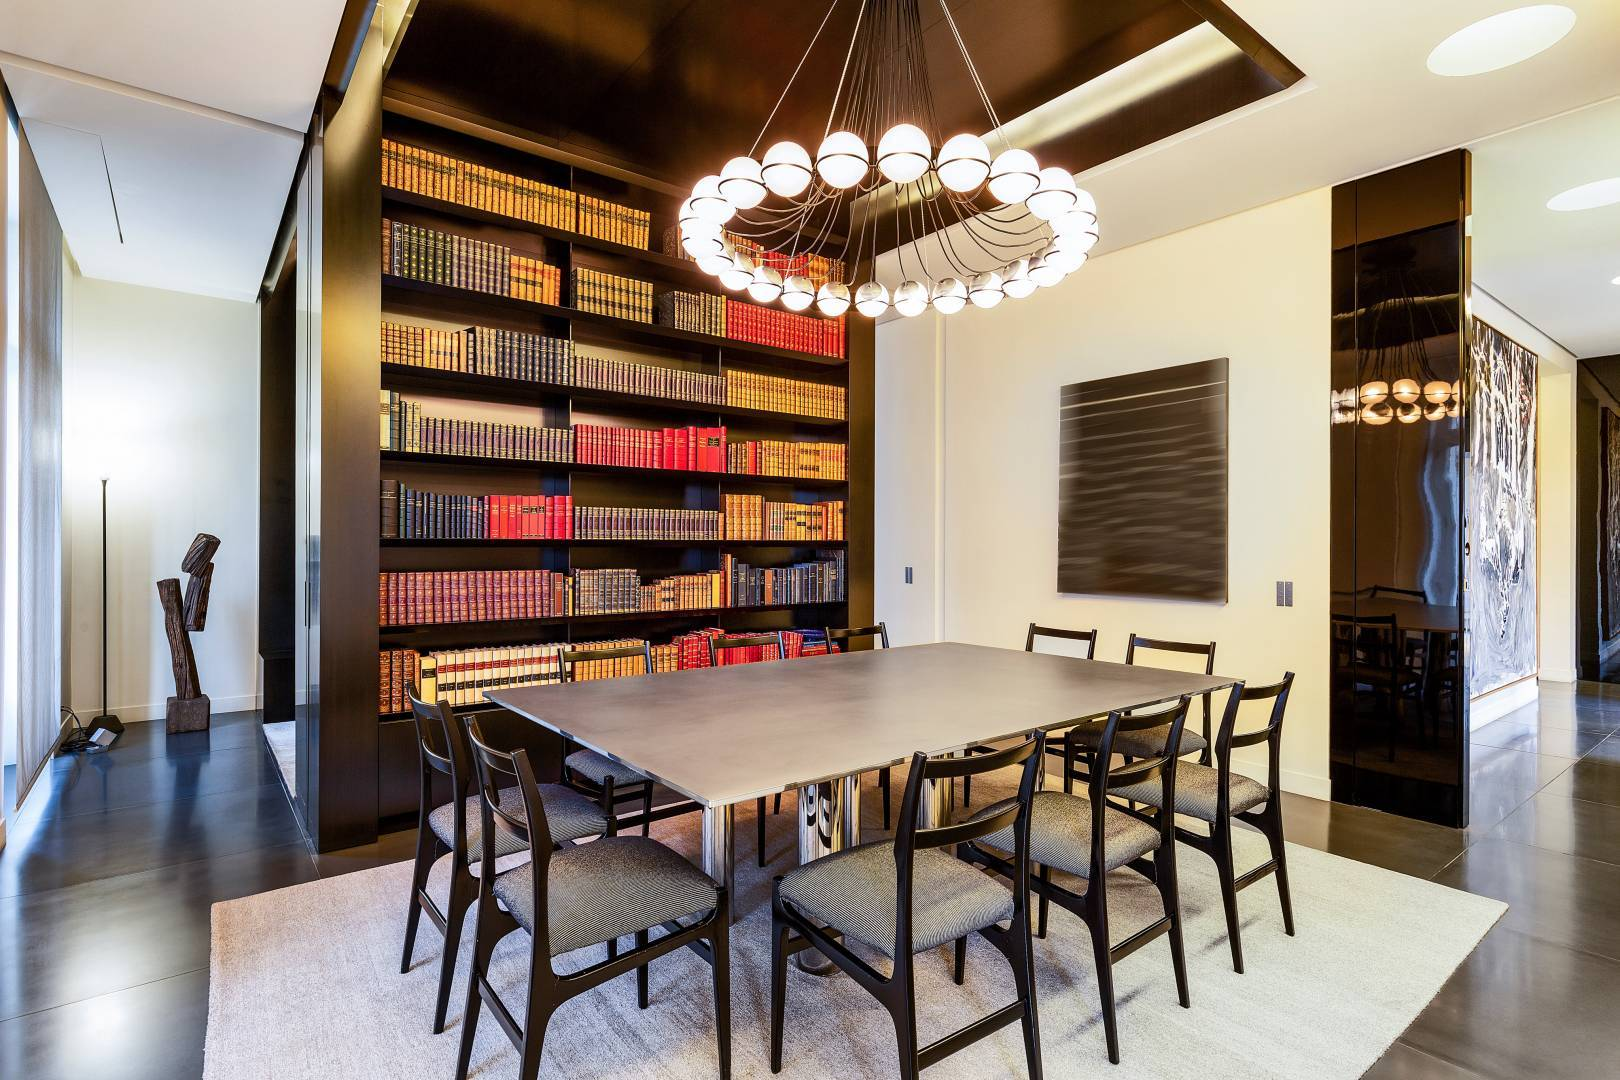 Apartment for sale, Paris 7th (75007), 7 rooms, 300 m² ...